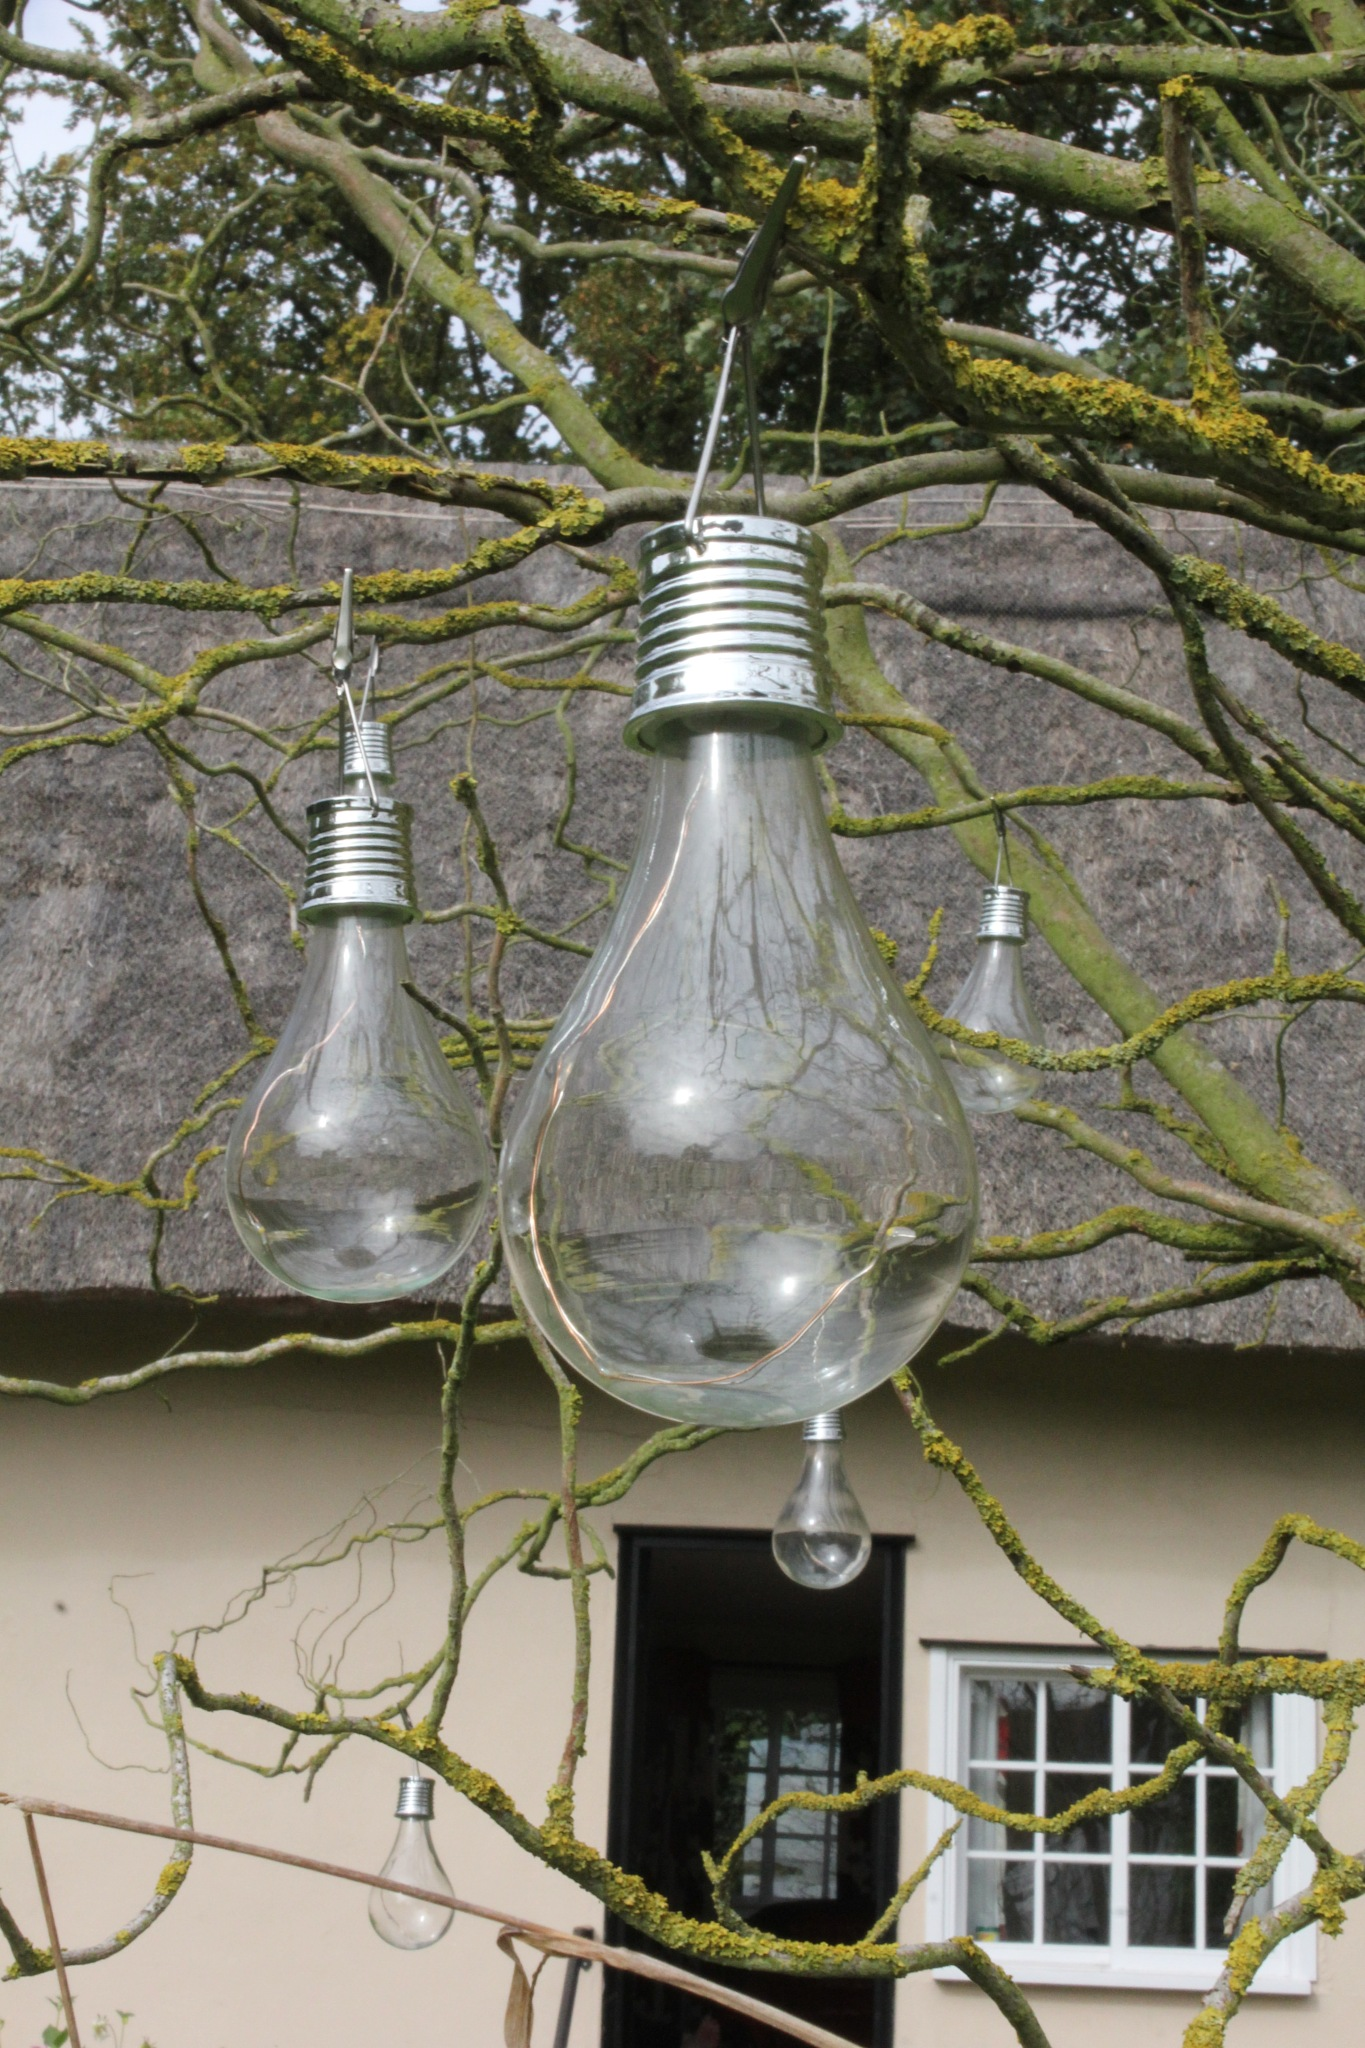 Tree of light by gary.macnicol